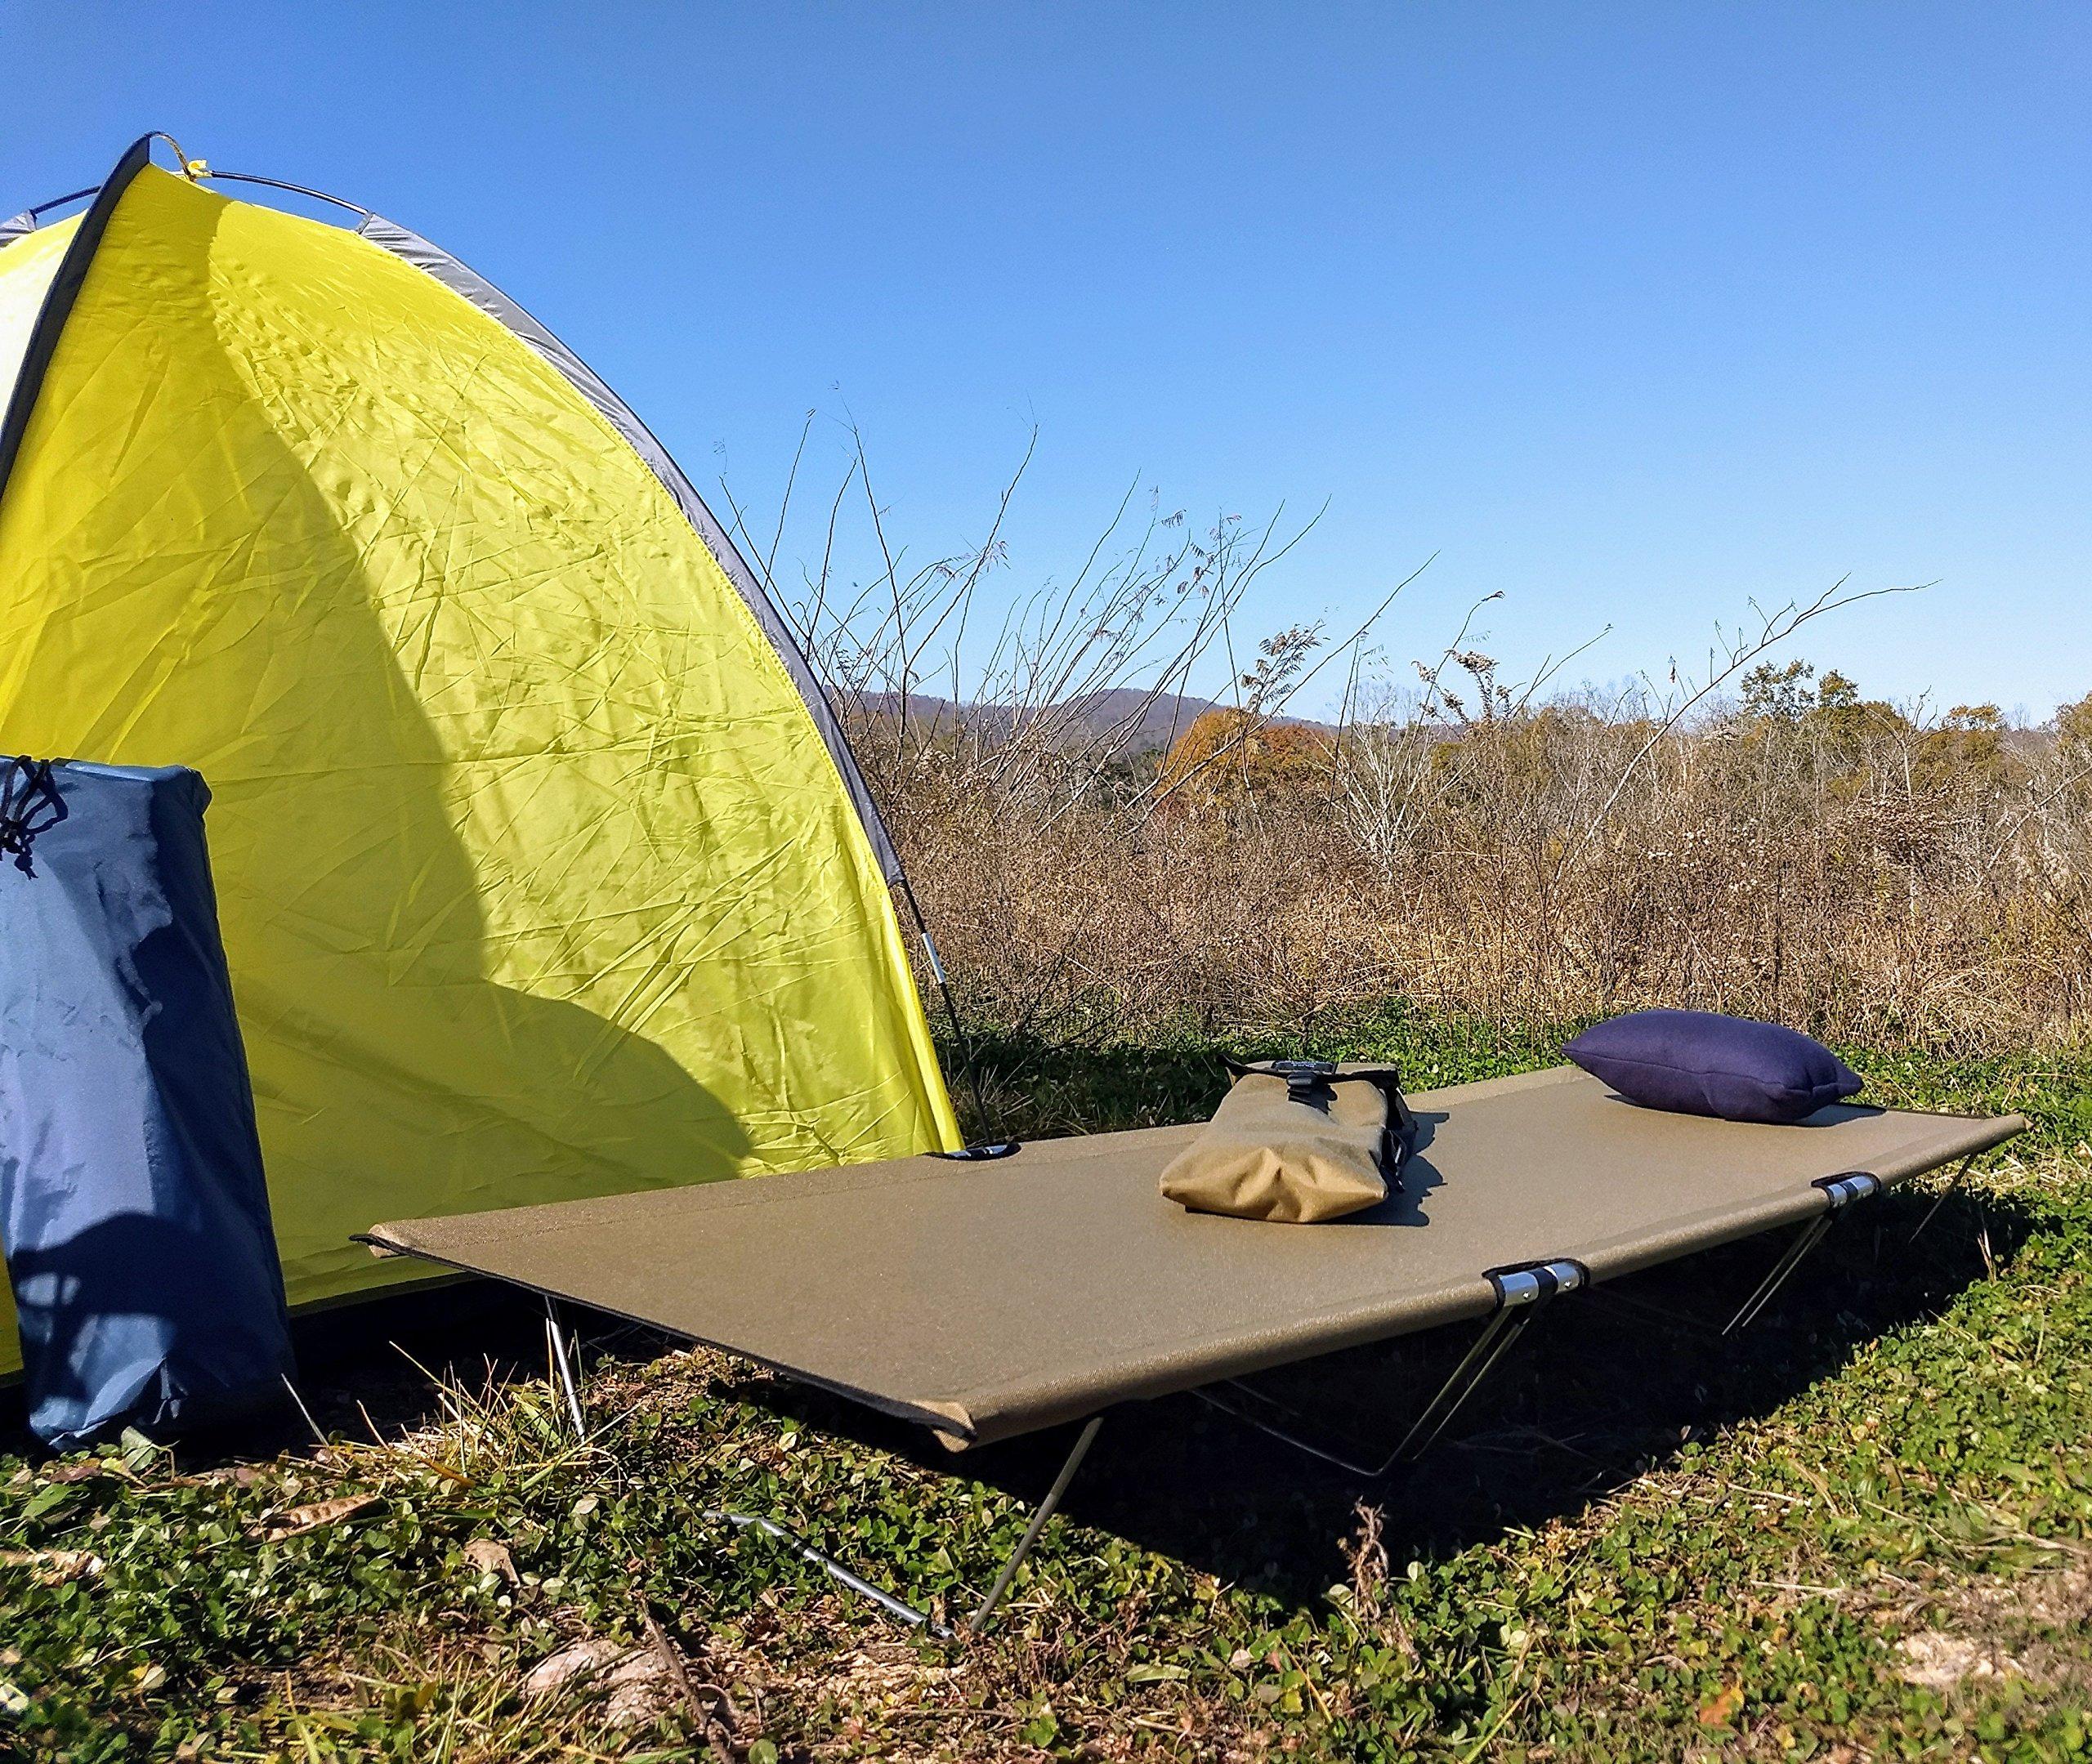 Go-Kot Regular Portable Folding Camping Cot, Coyote Brown by Go-Kot (Image #1)